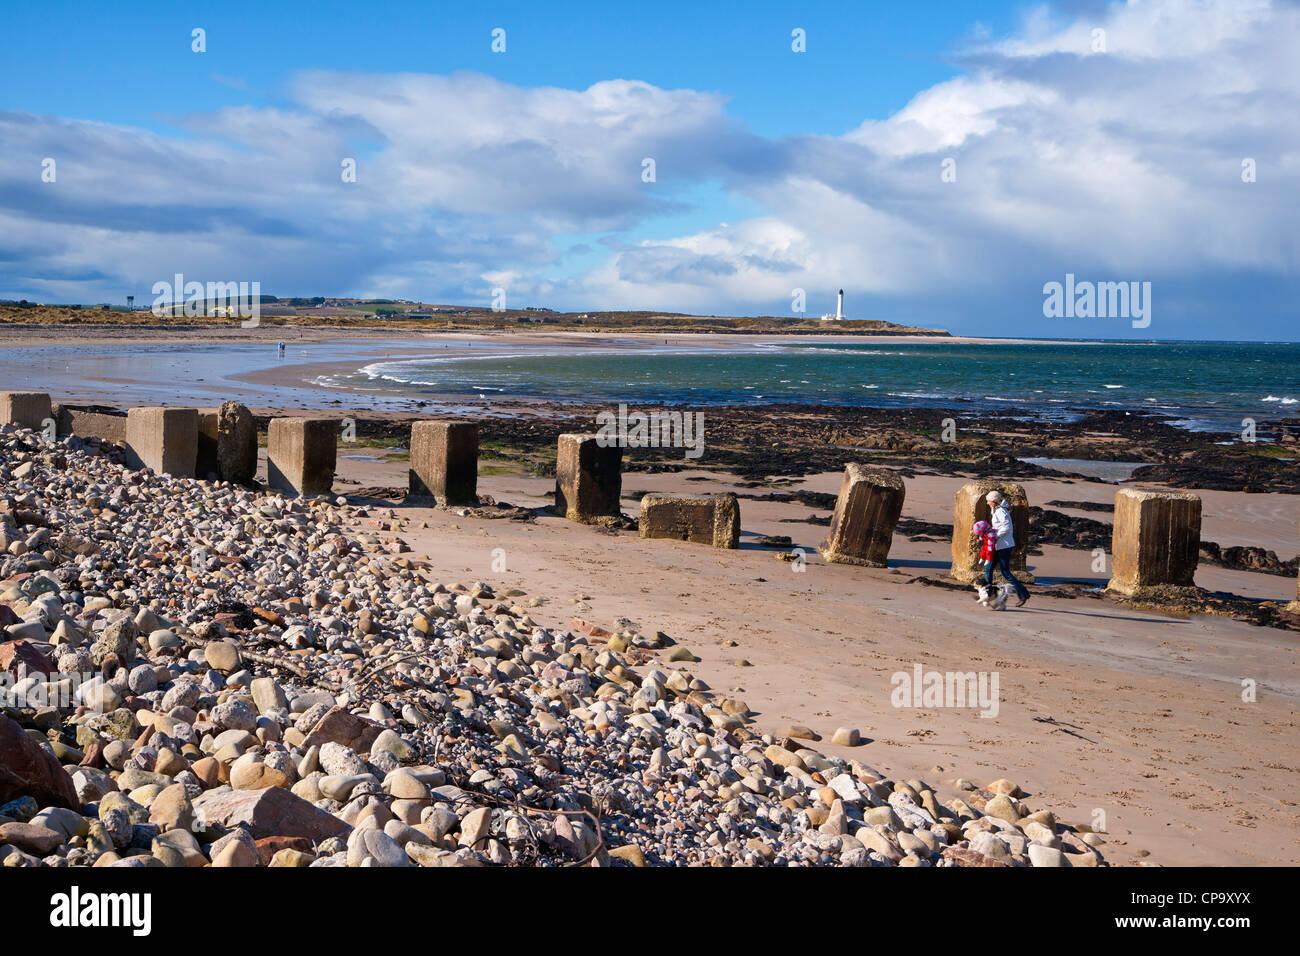 Lossiemouth, Moray Firth, Scotland - Stock Image